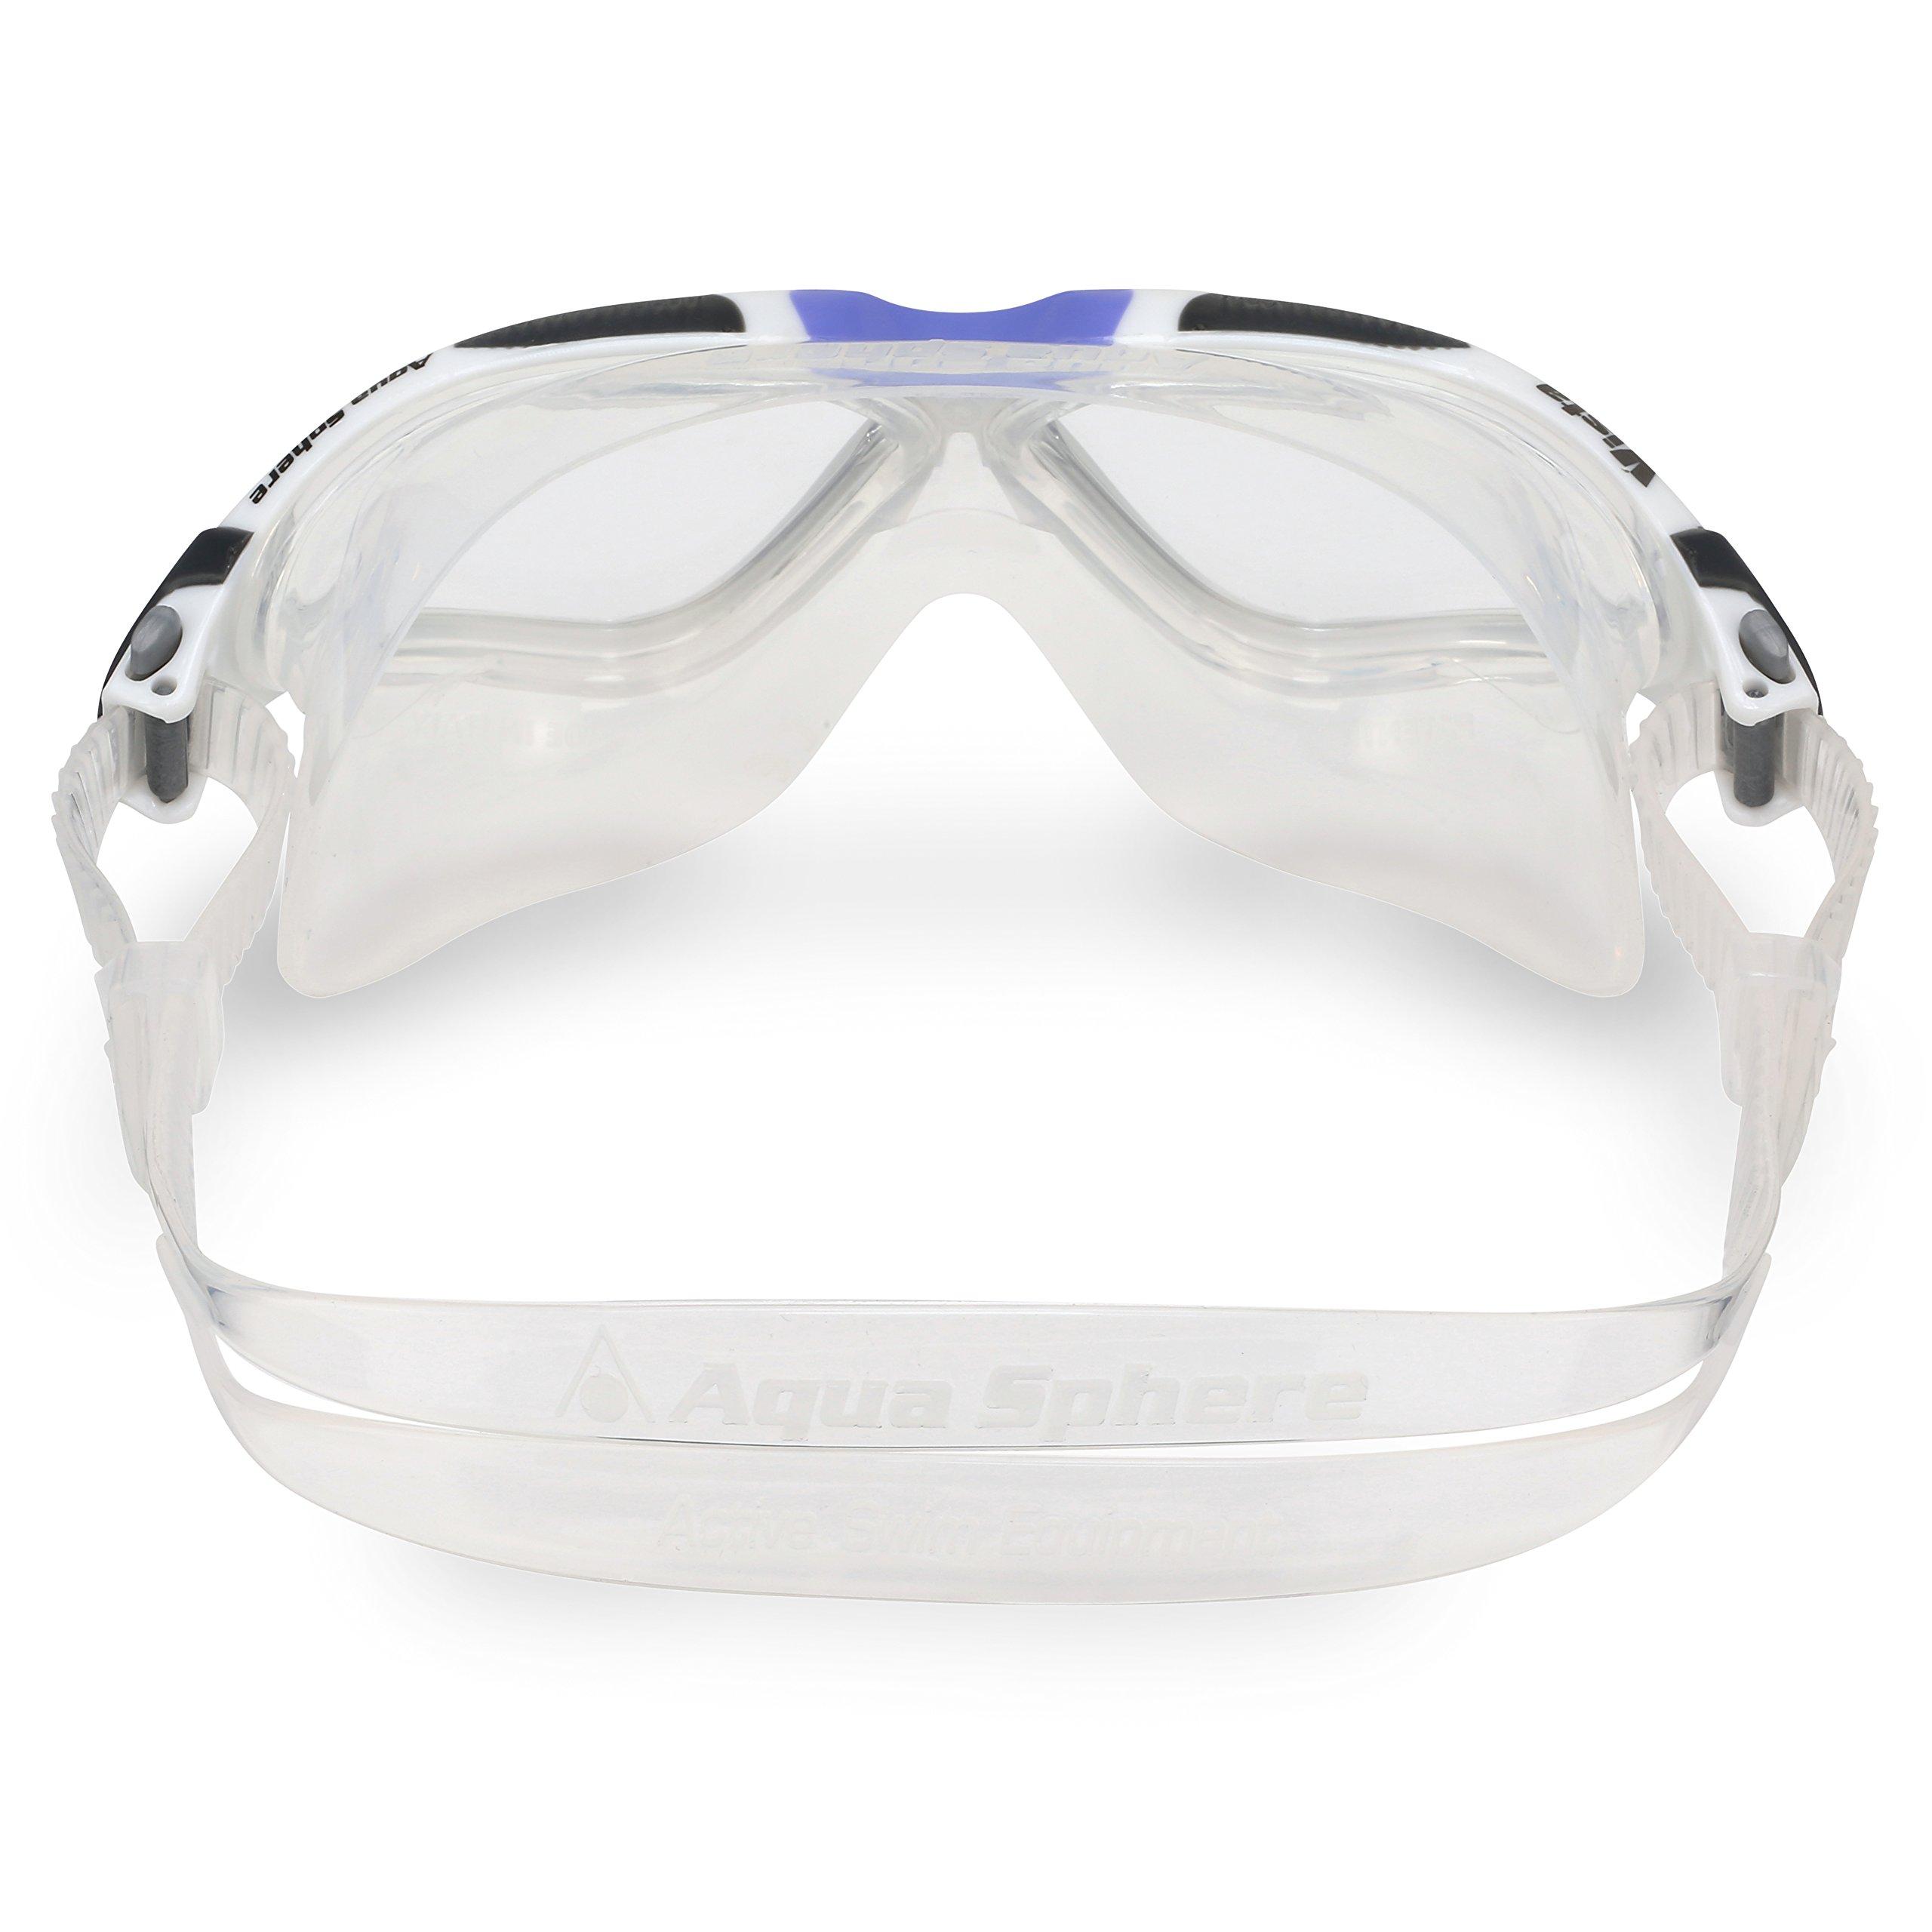 Aqua Sphere Vista Ladies Swimming Goggles - Swim Mask - White Lavender 7bf20ad6e894